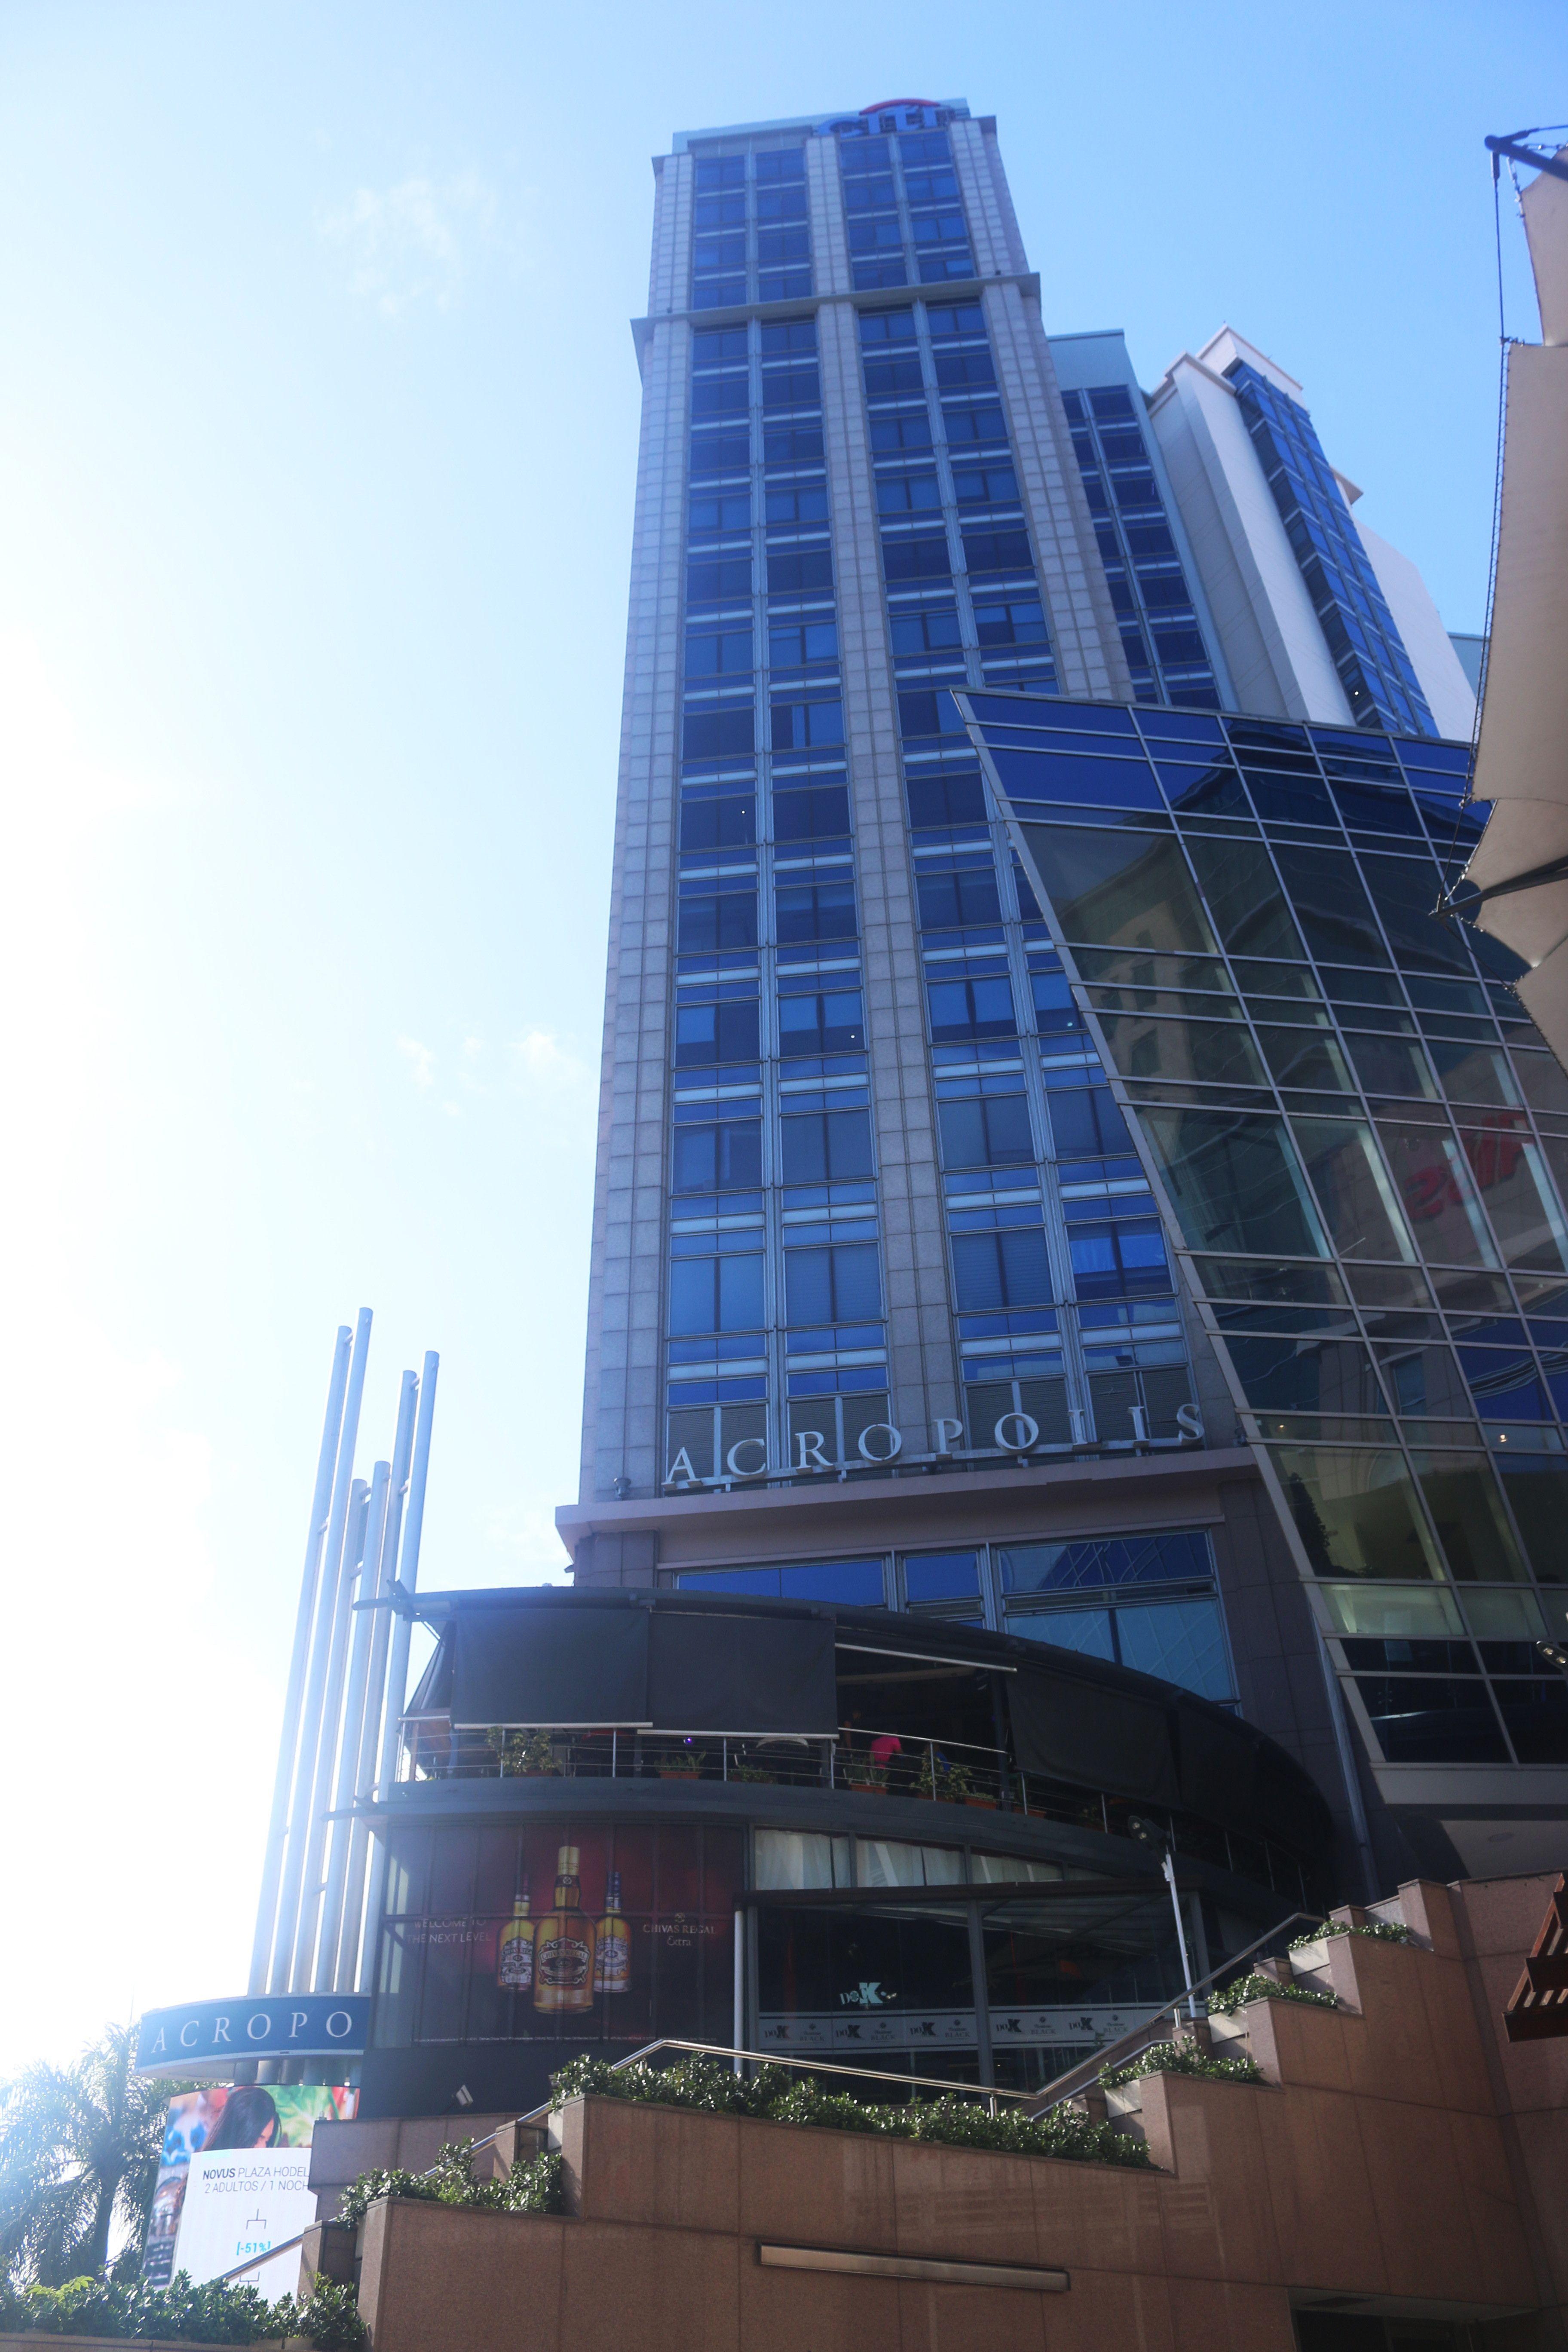 Una inversión de altura Acrópolis Center & Citi Tower